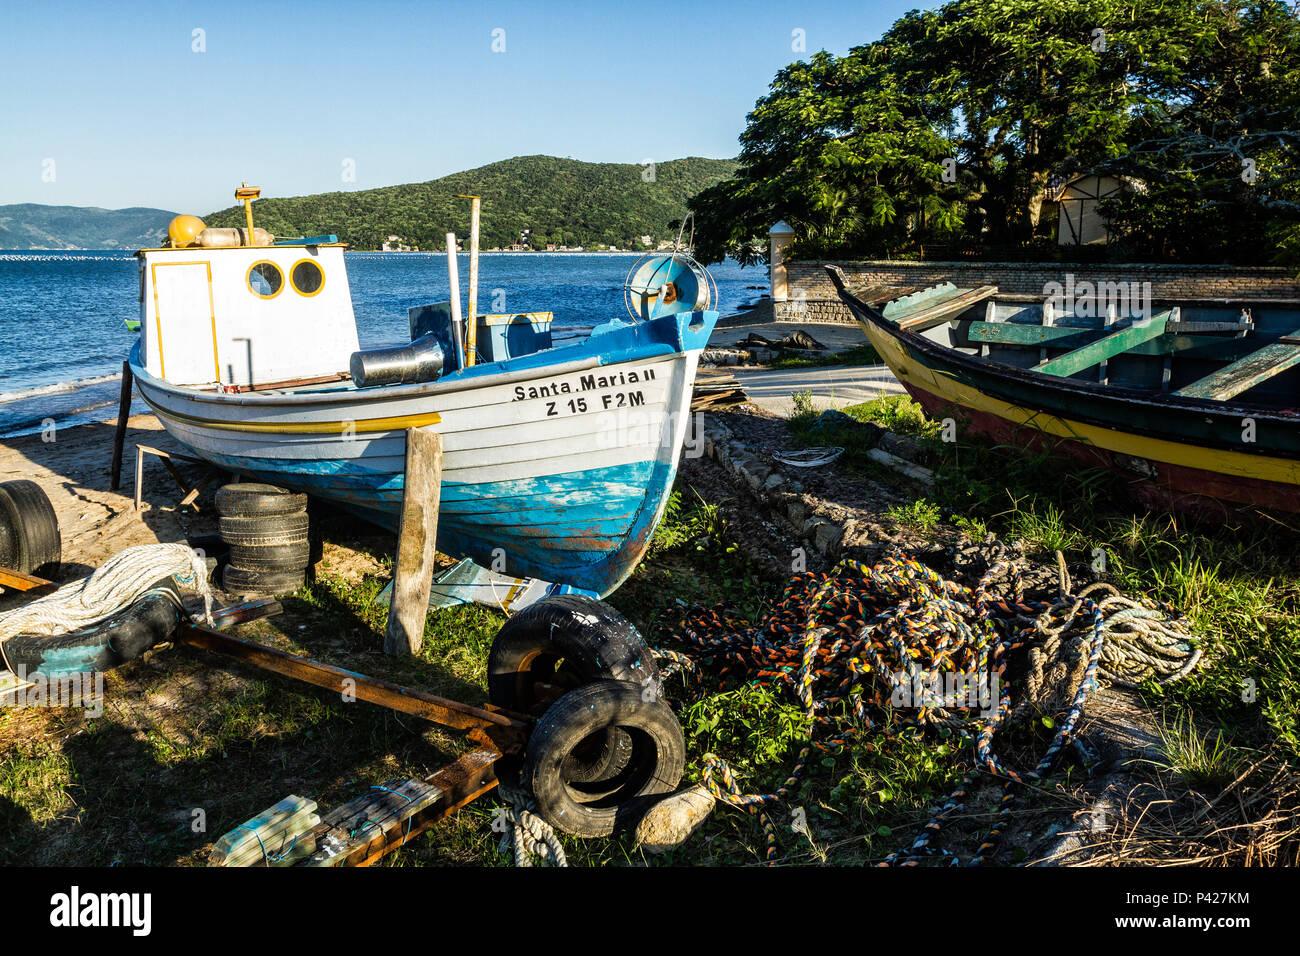 Barcos atracados na Enseada do Brito. Palhoça, Santa Catarina, Brasil. Stock Photo